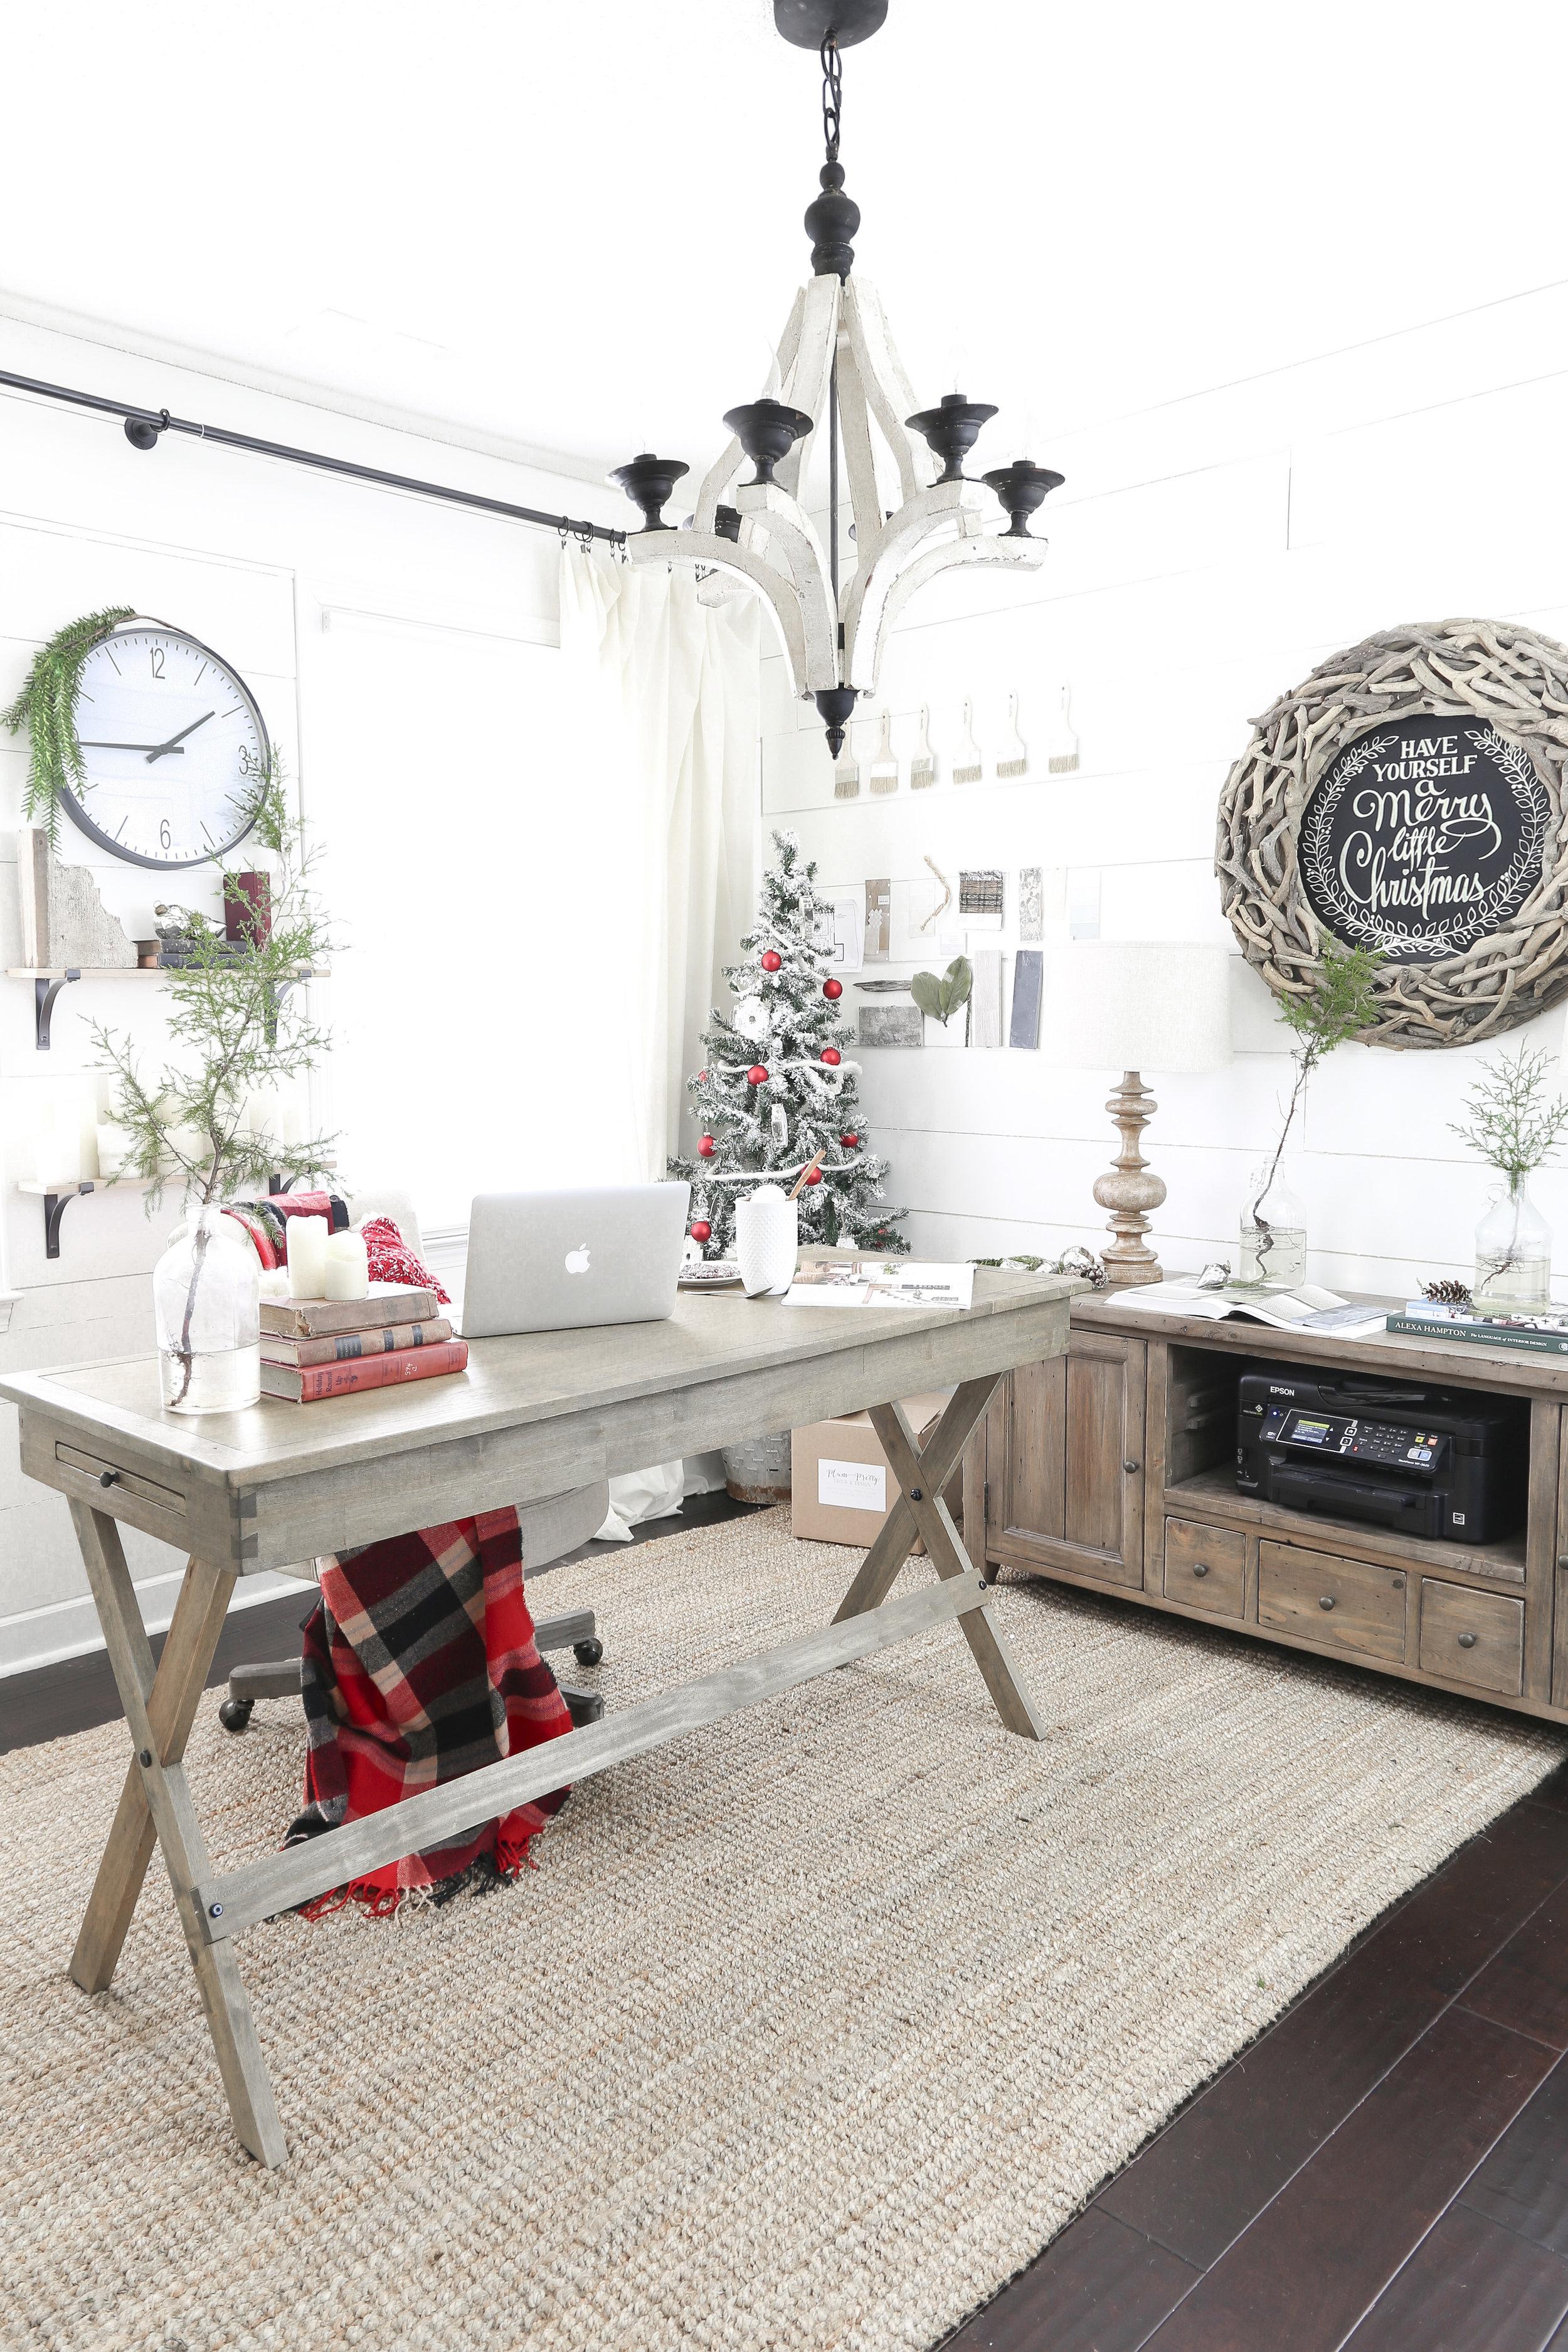 Christmas Home Tour- Holiday Office Decor - Plum Pretty Decor and Design